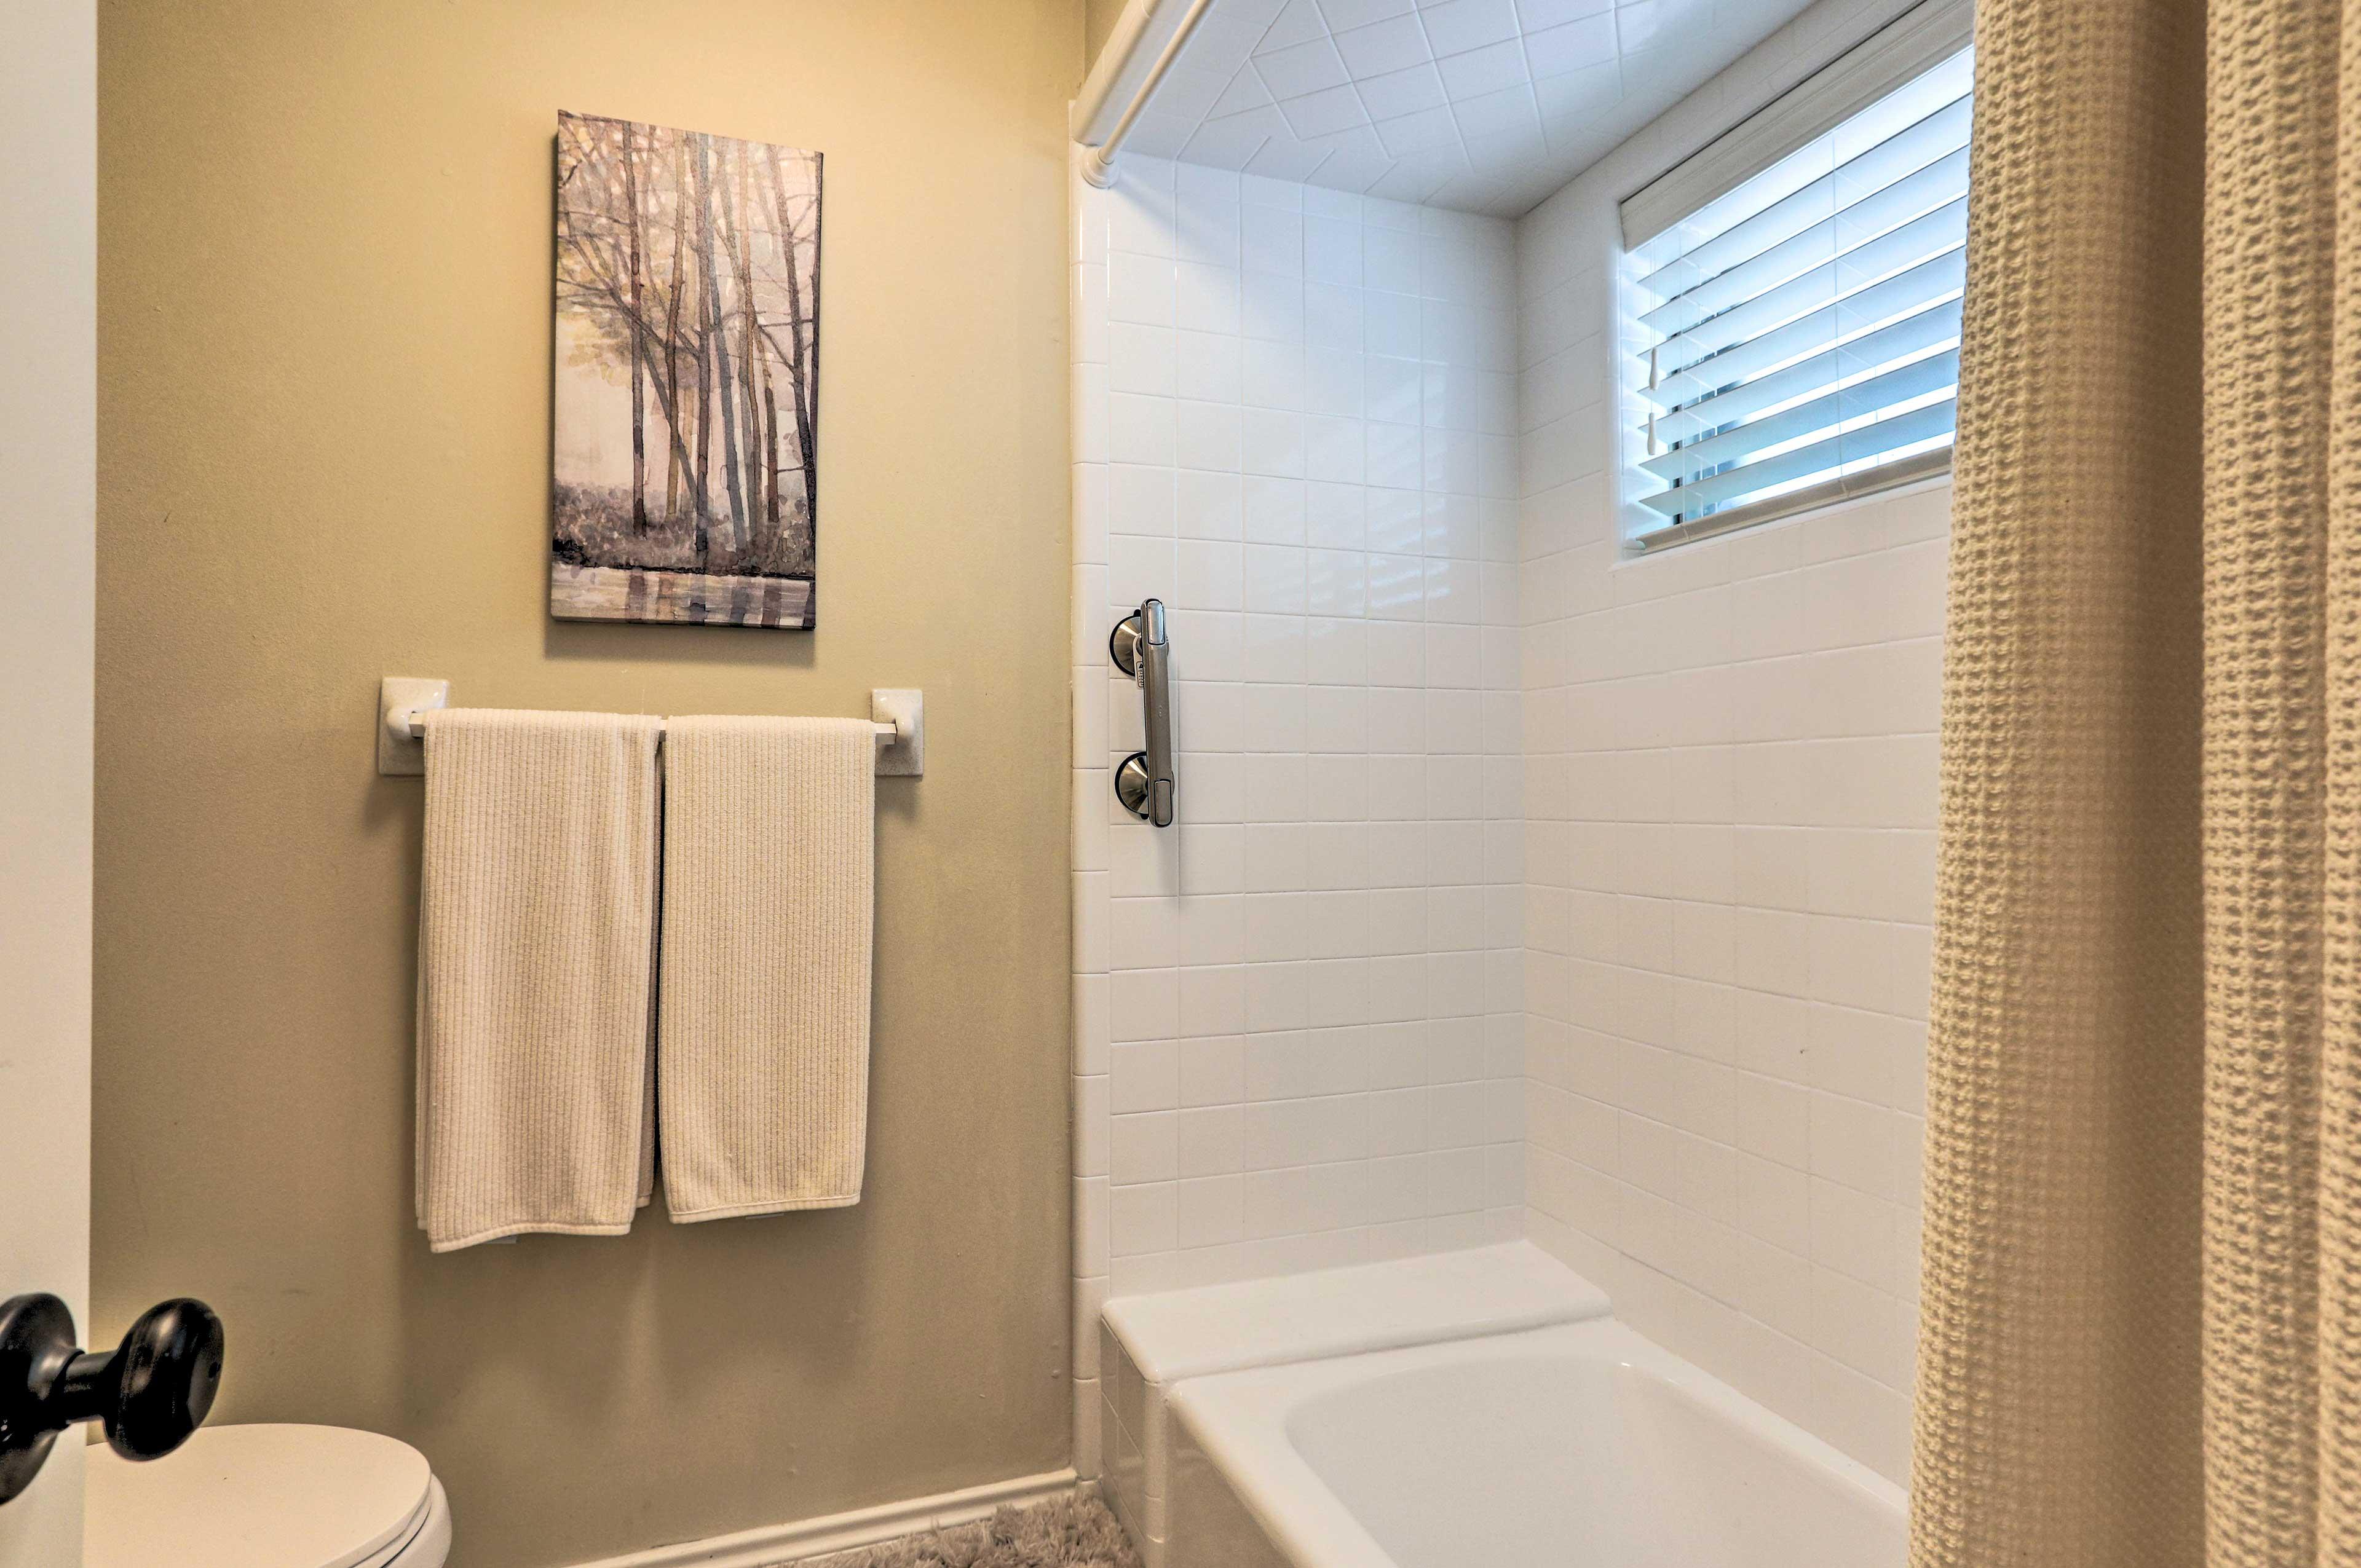 Enjoy a relaxing soak in the bathtub.